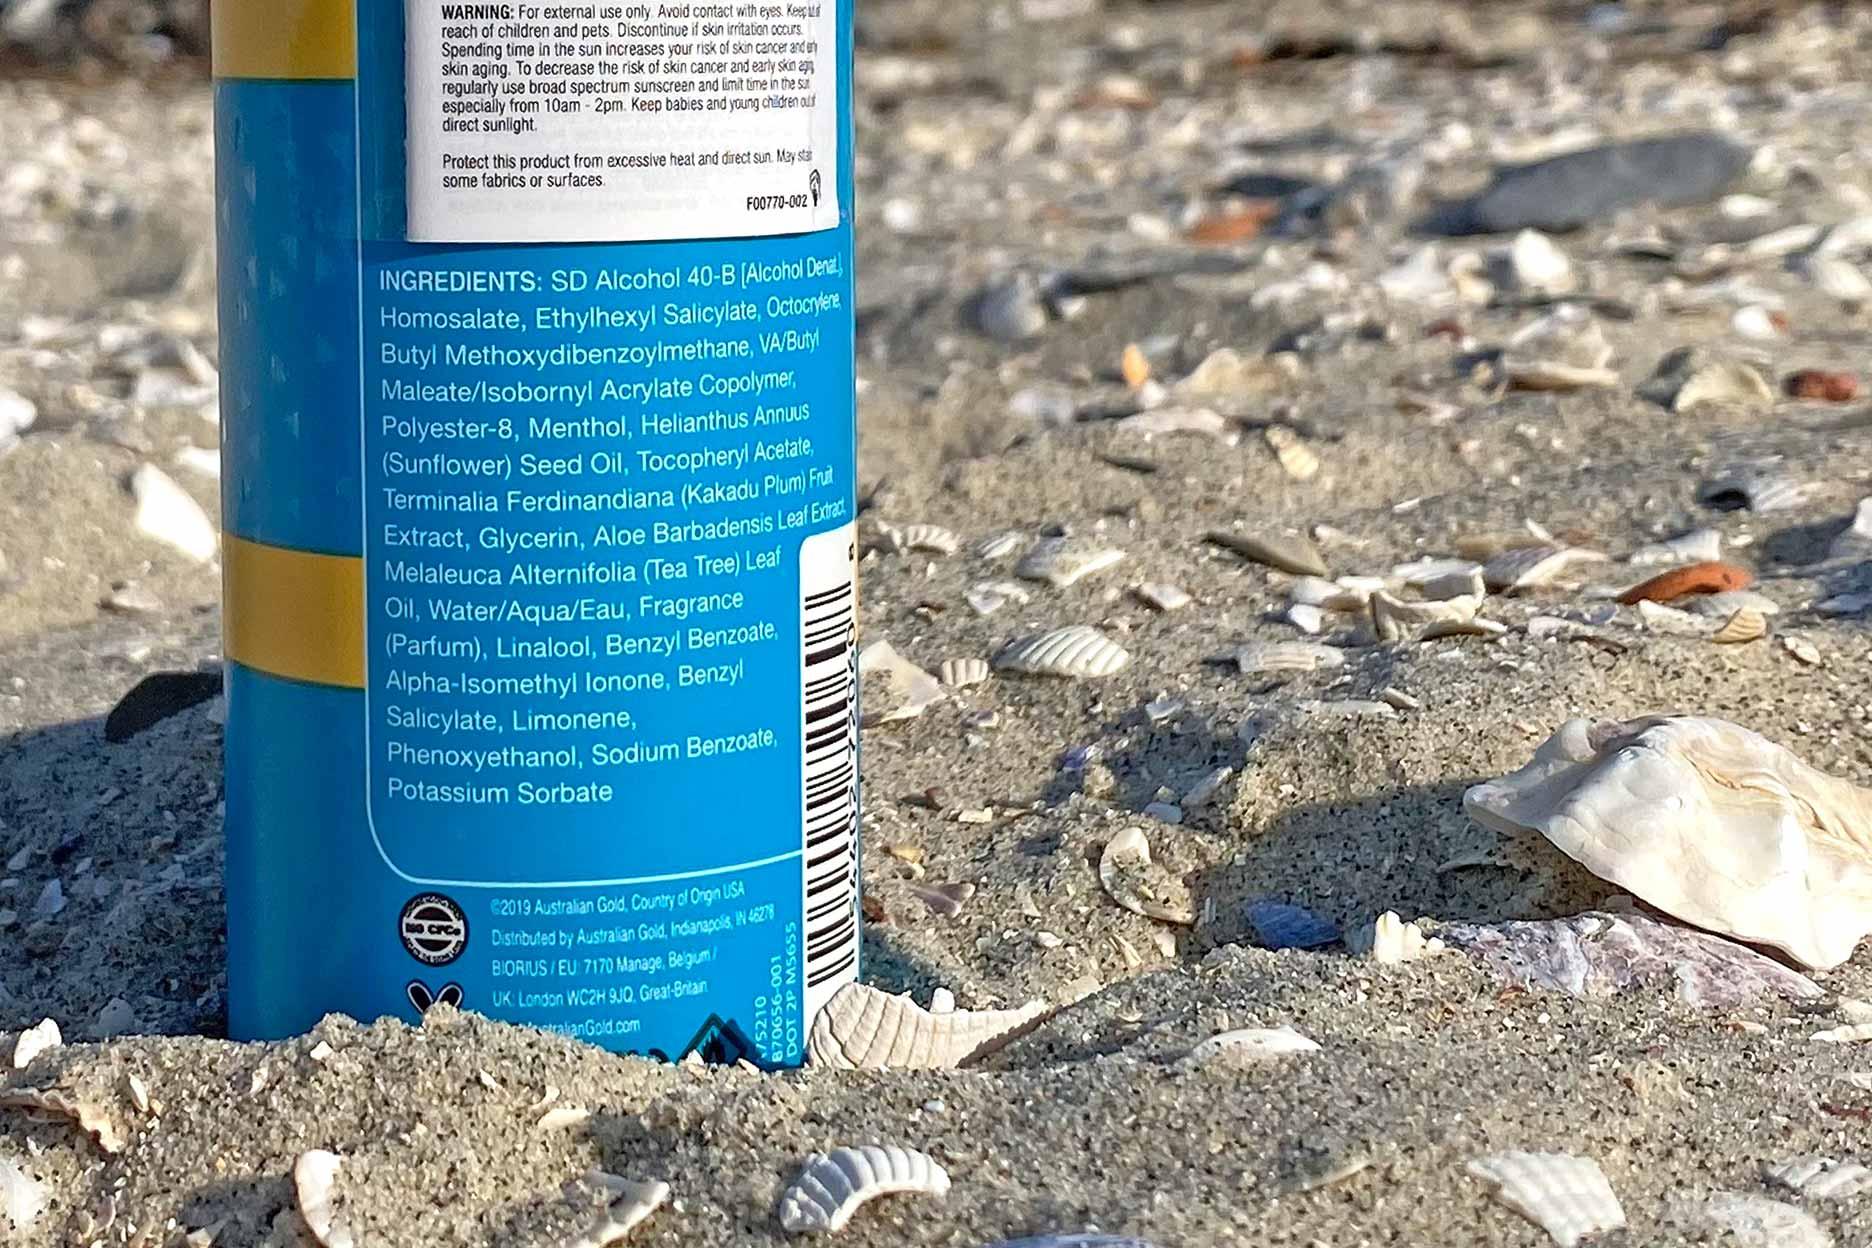 australian gold spf 30 active chill spray ingredienten review